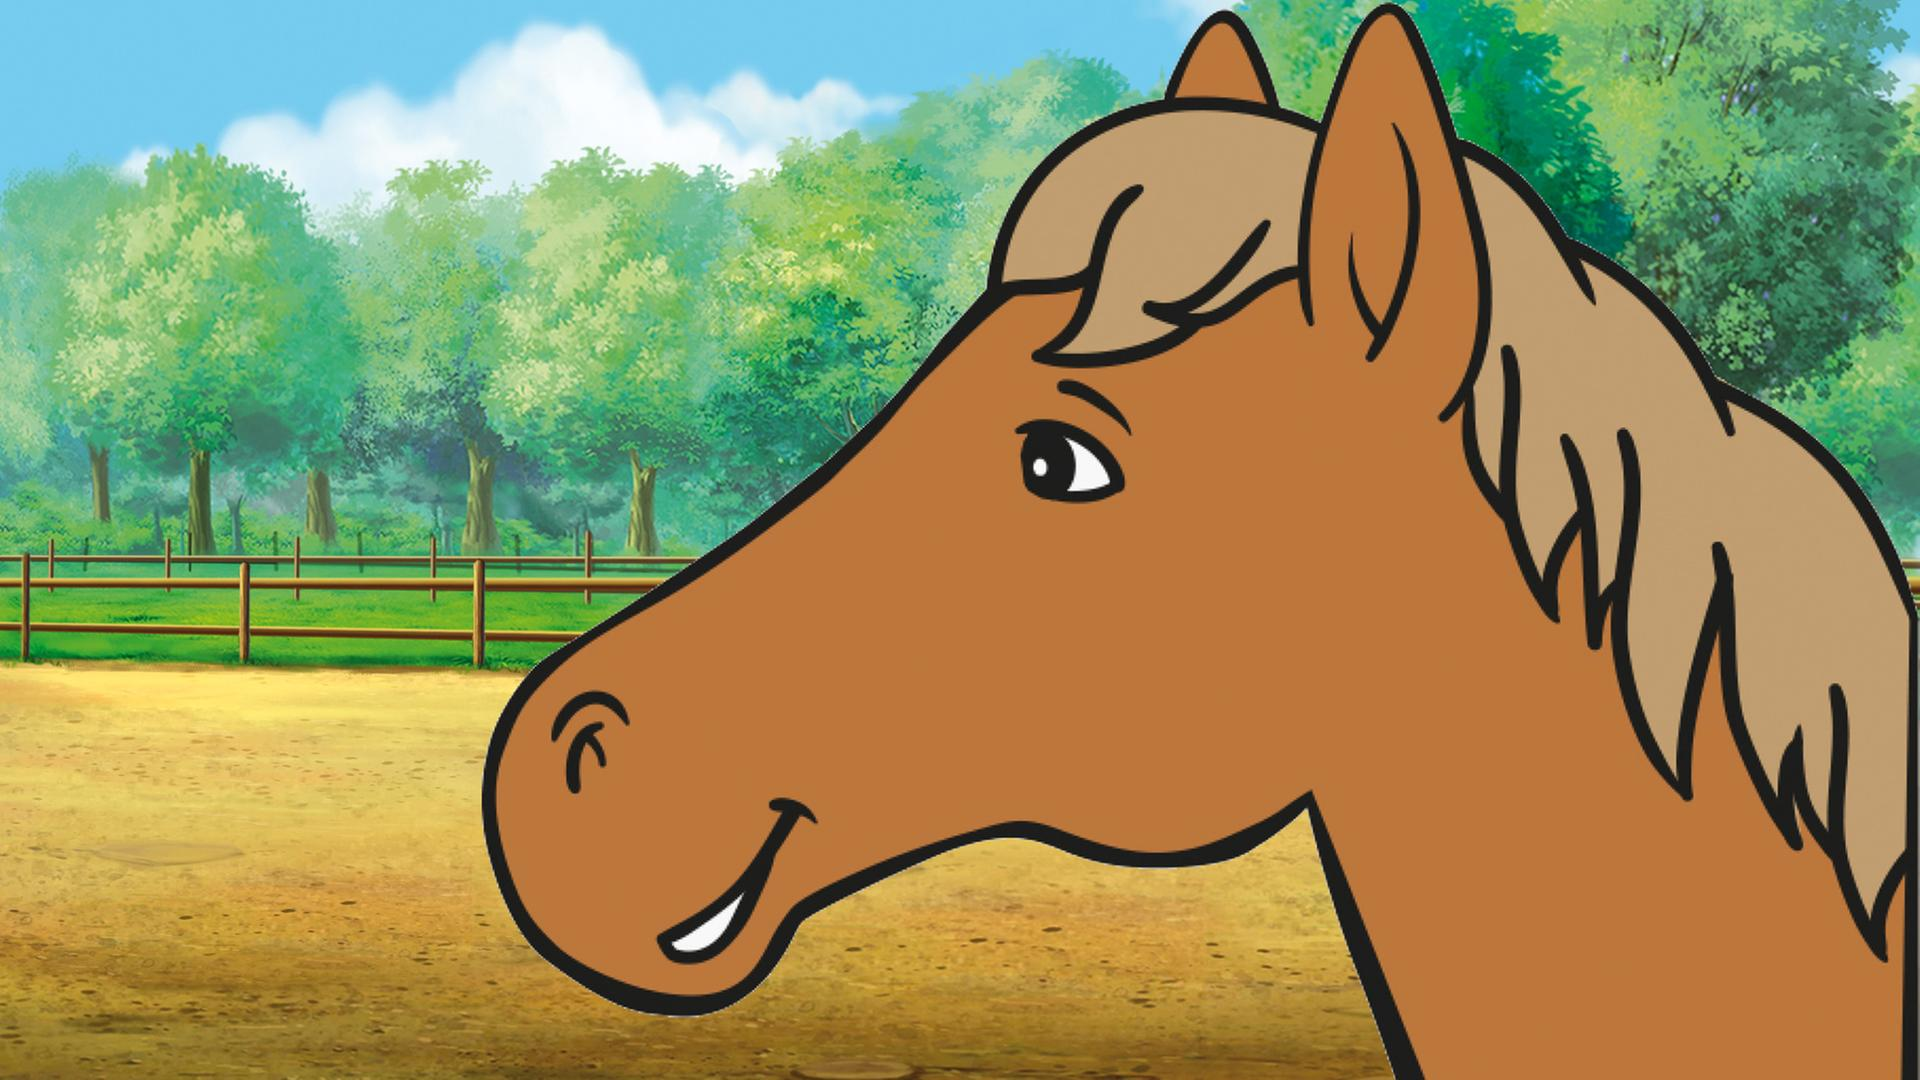 bibi und tina-lifehex: pferdekissen - zdfmediathek